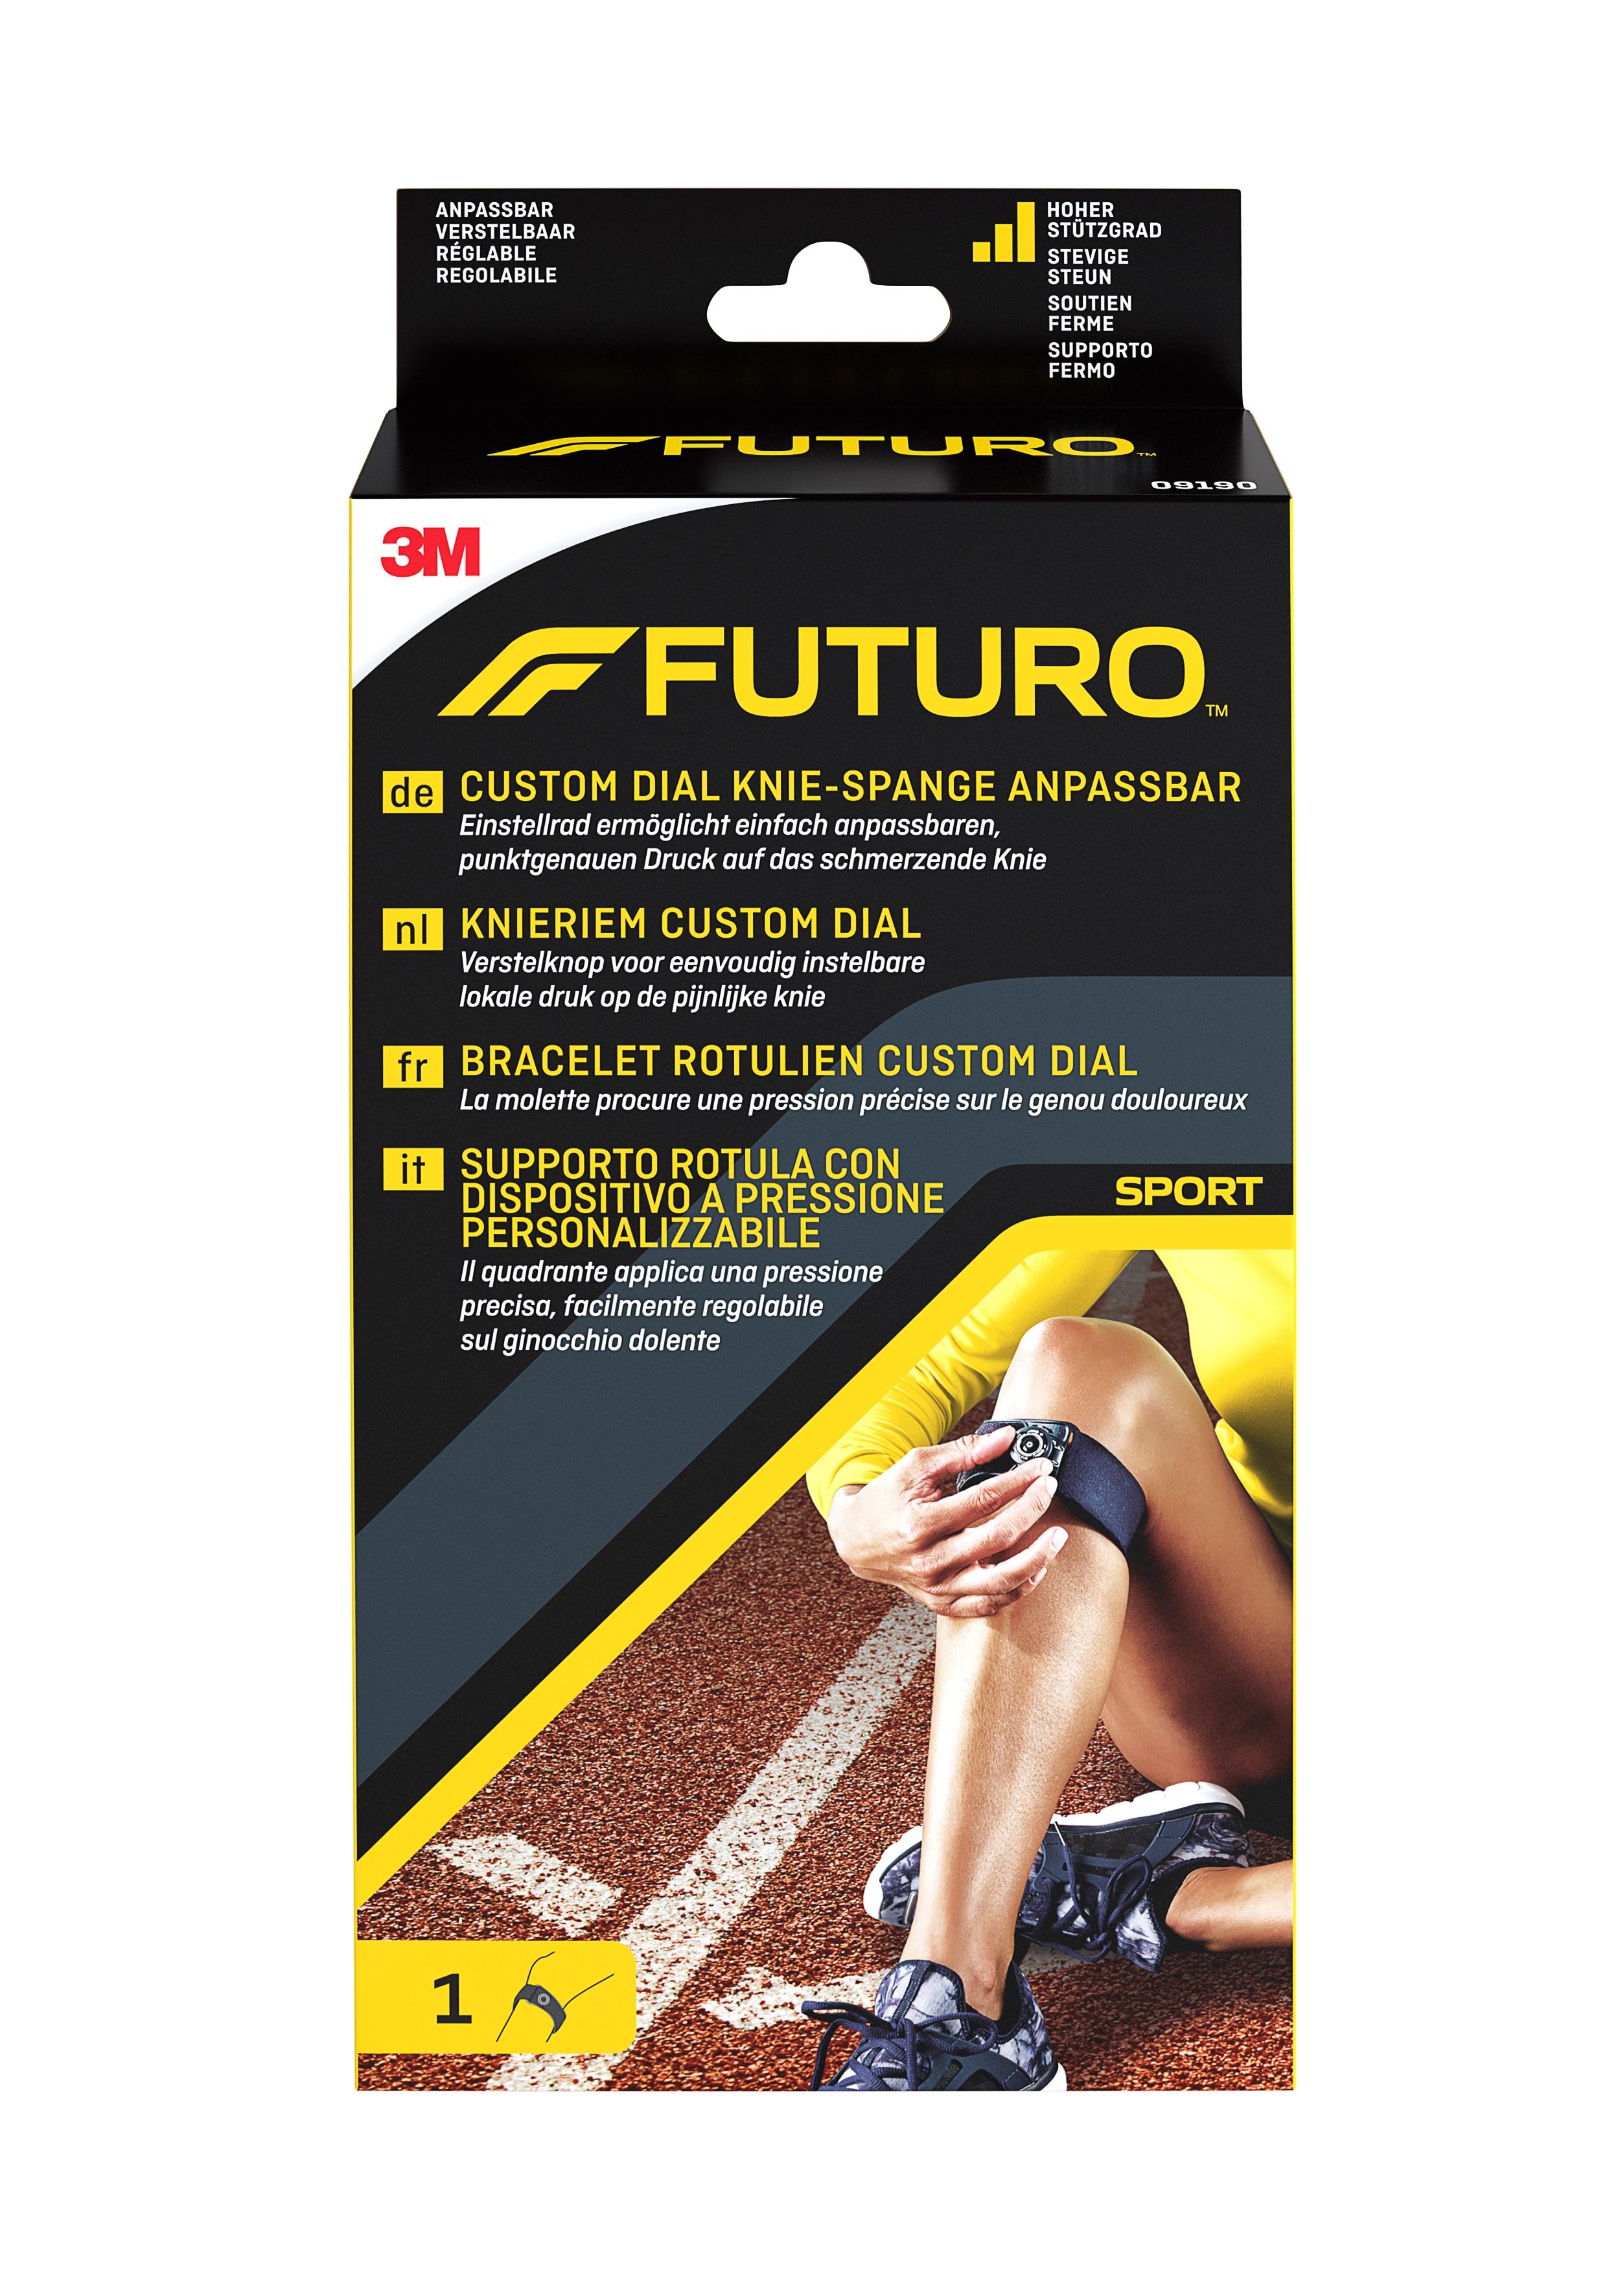 FUTURO™ Custom Dial Knie-Spange anpassbar